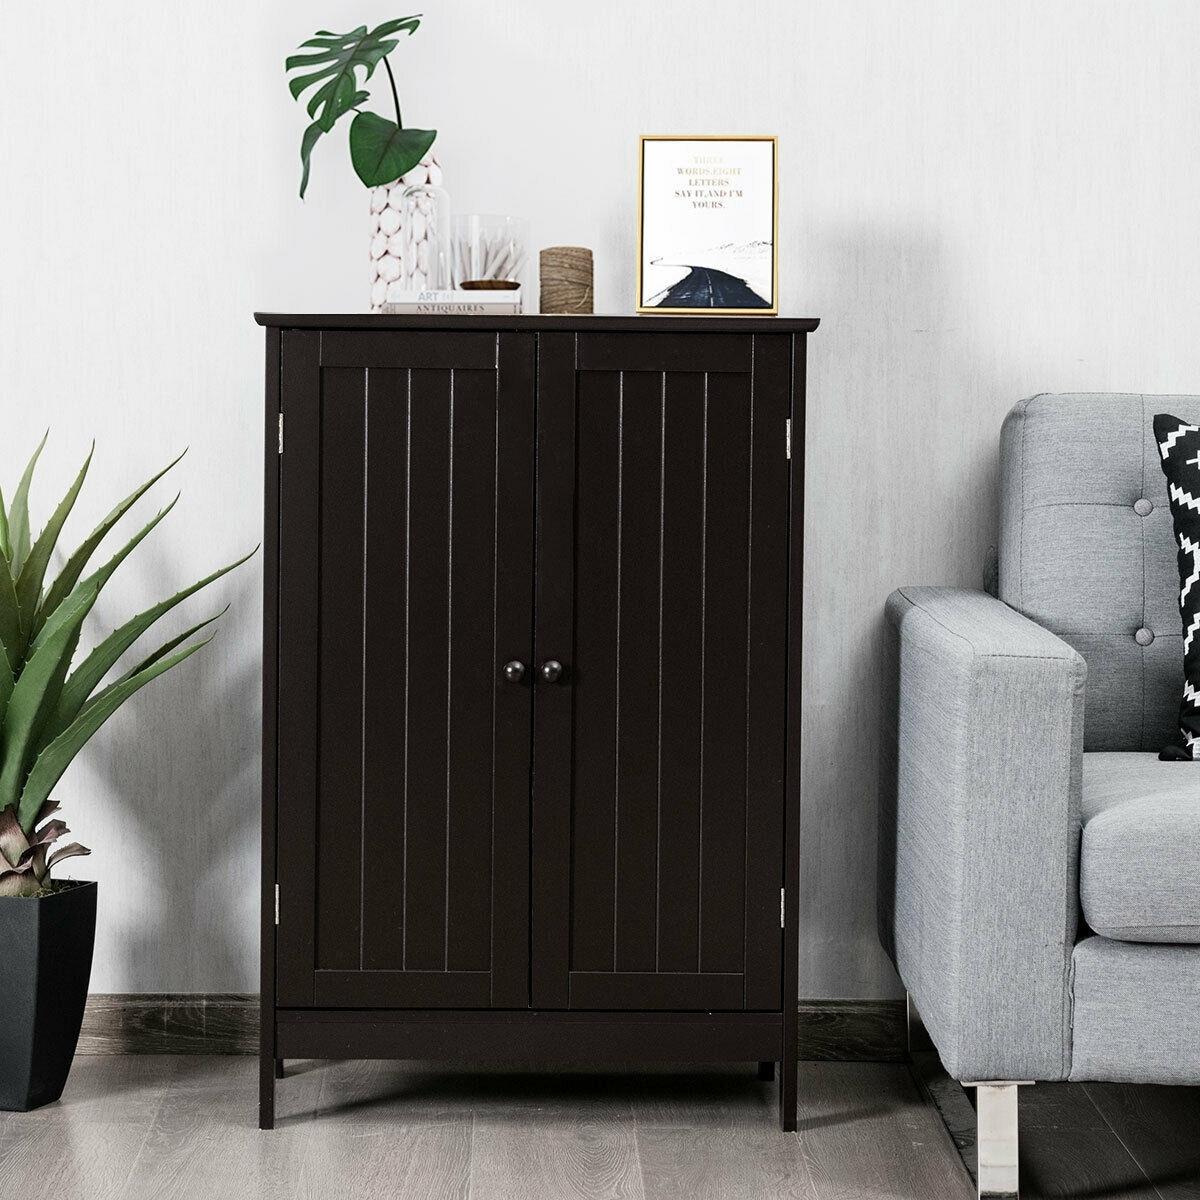 Gymax Bathroom Floor Storage Cabinet